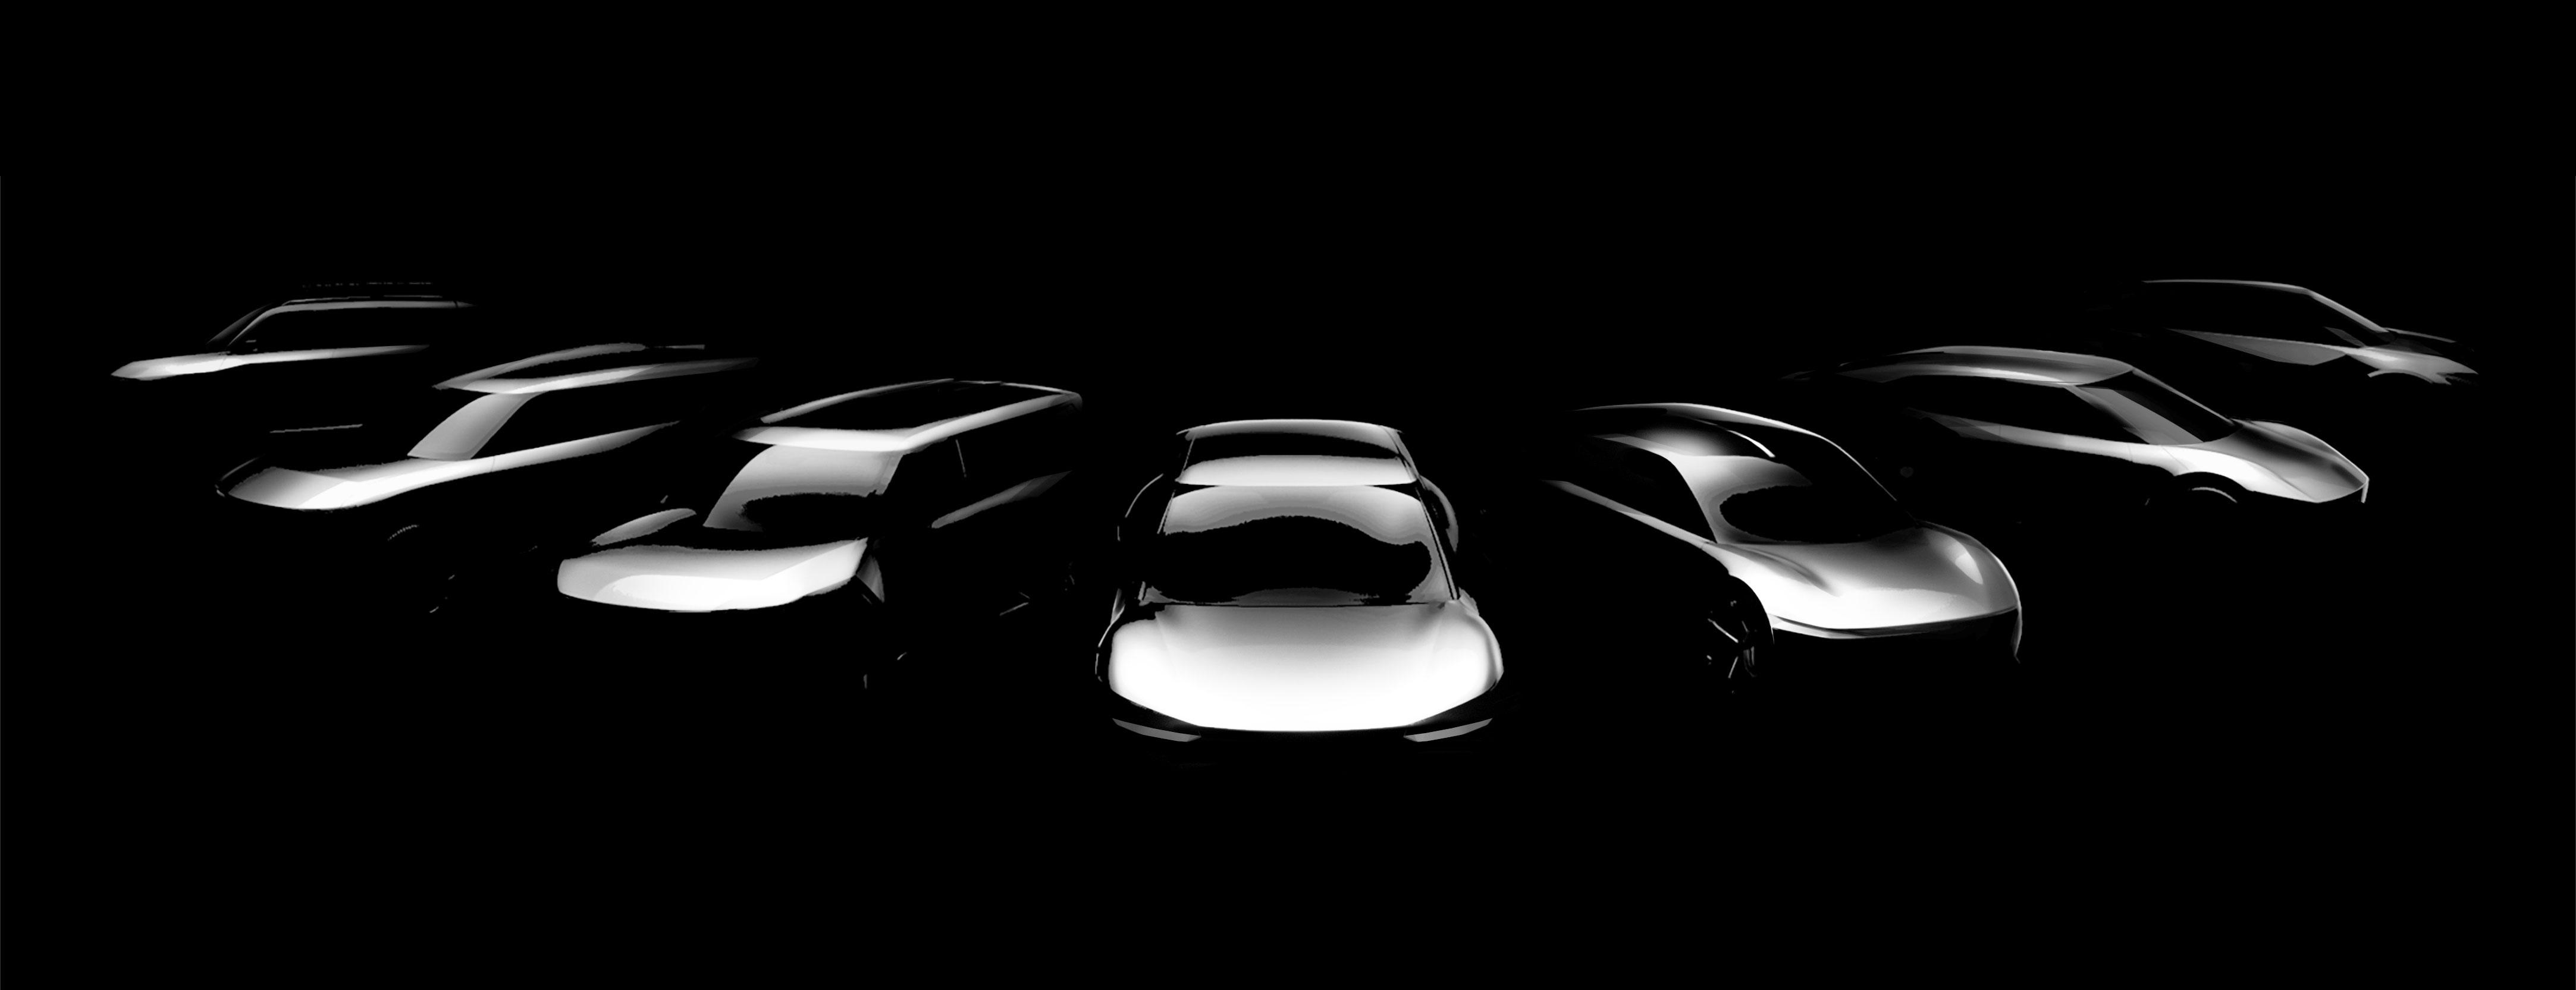 Hyundai-Elektroautos-Teaser-2020-1